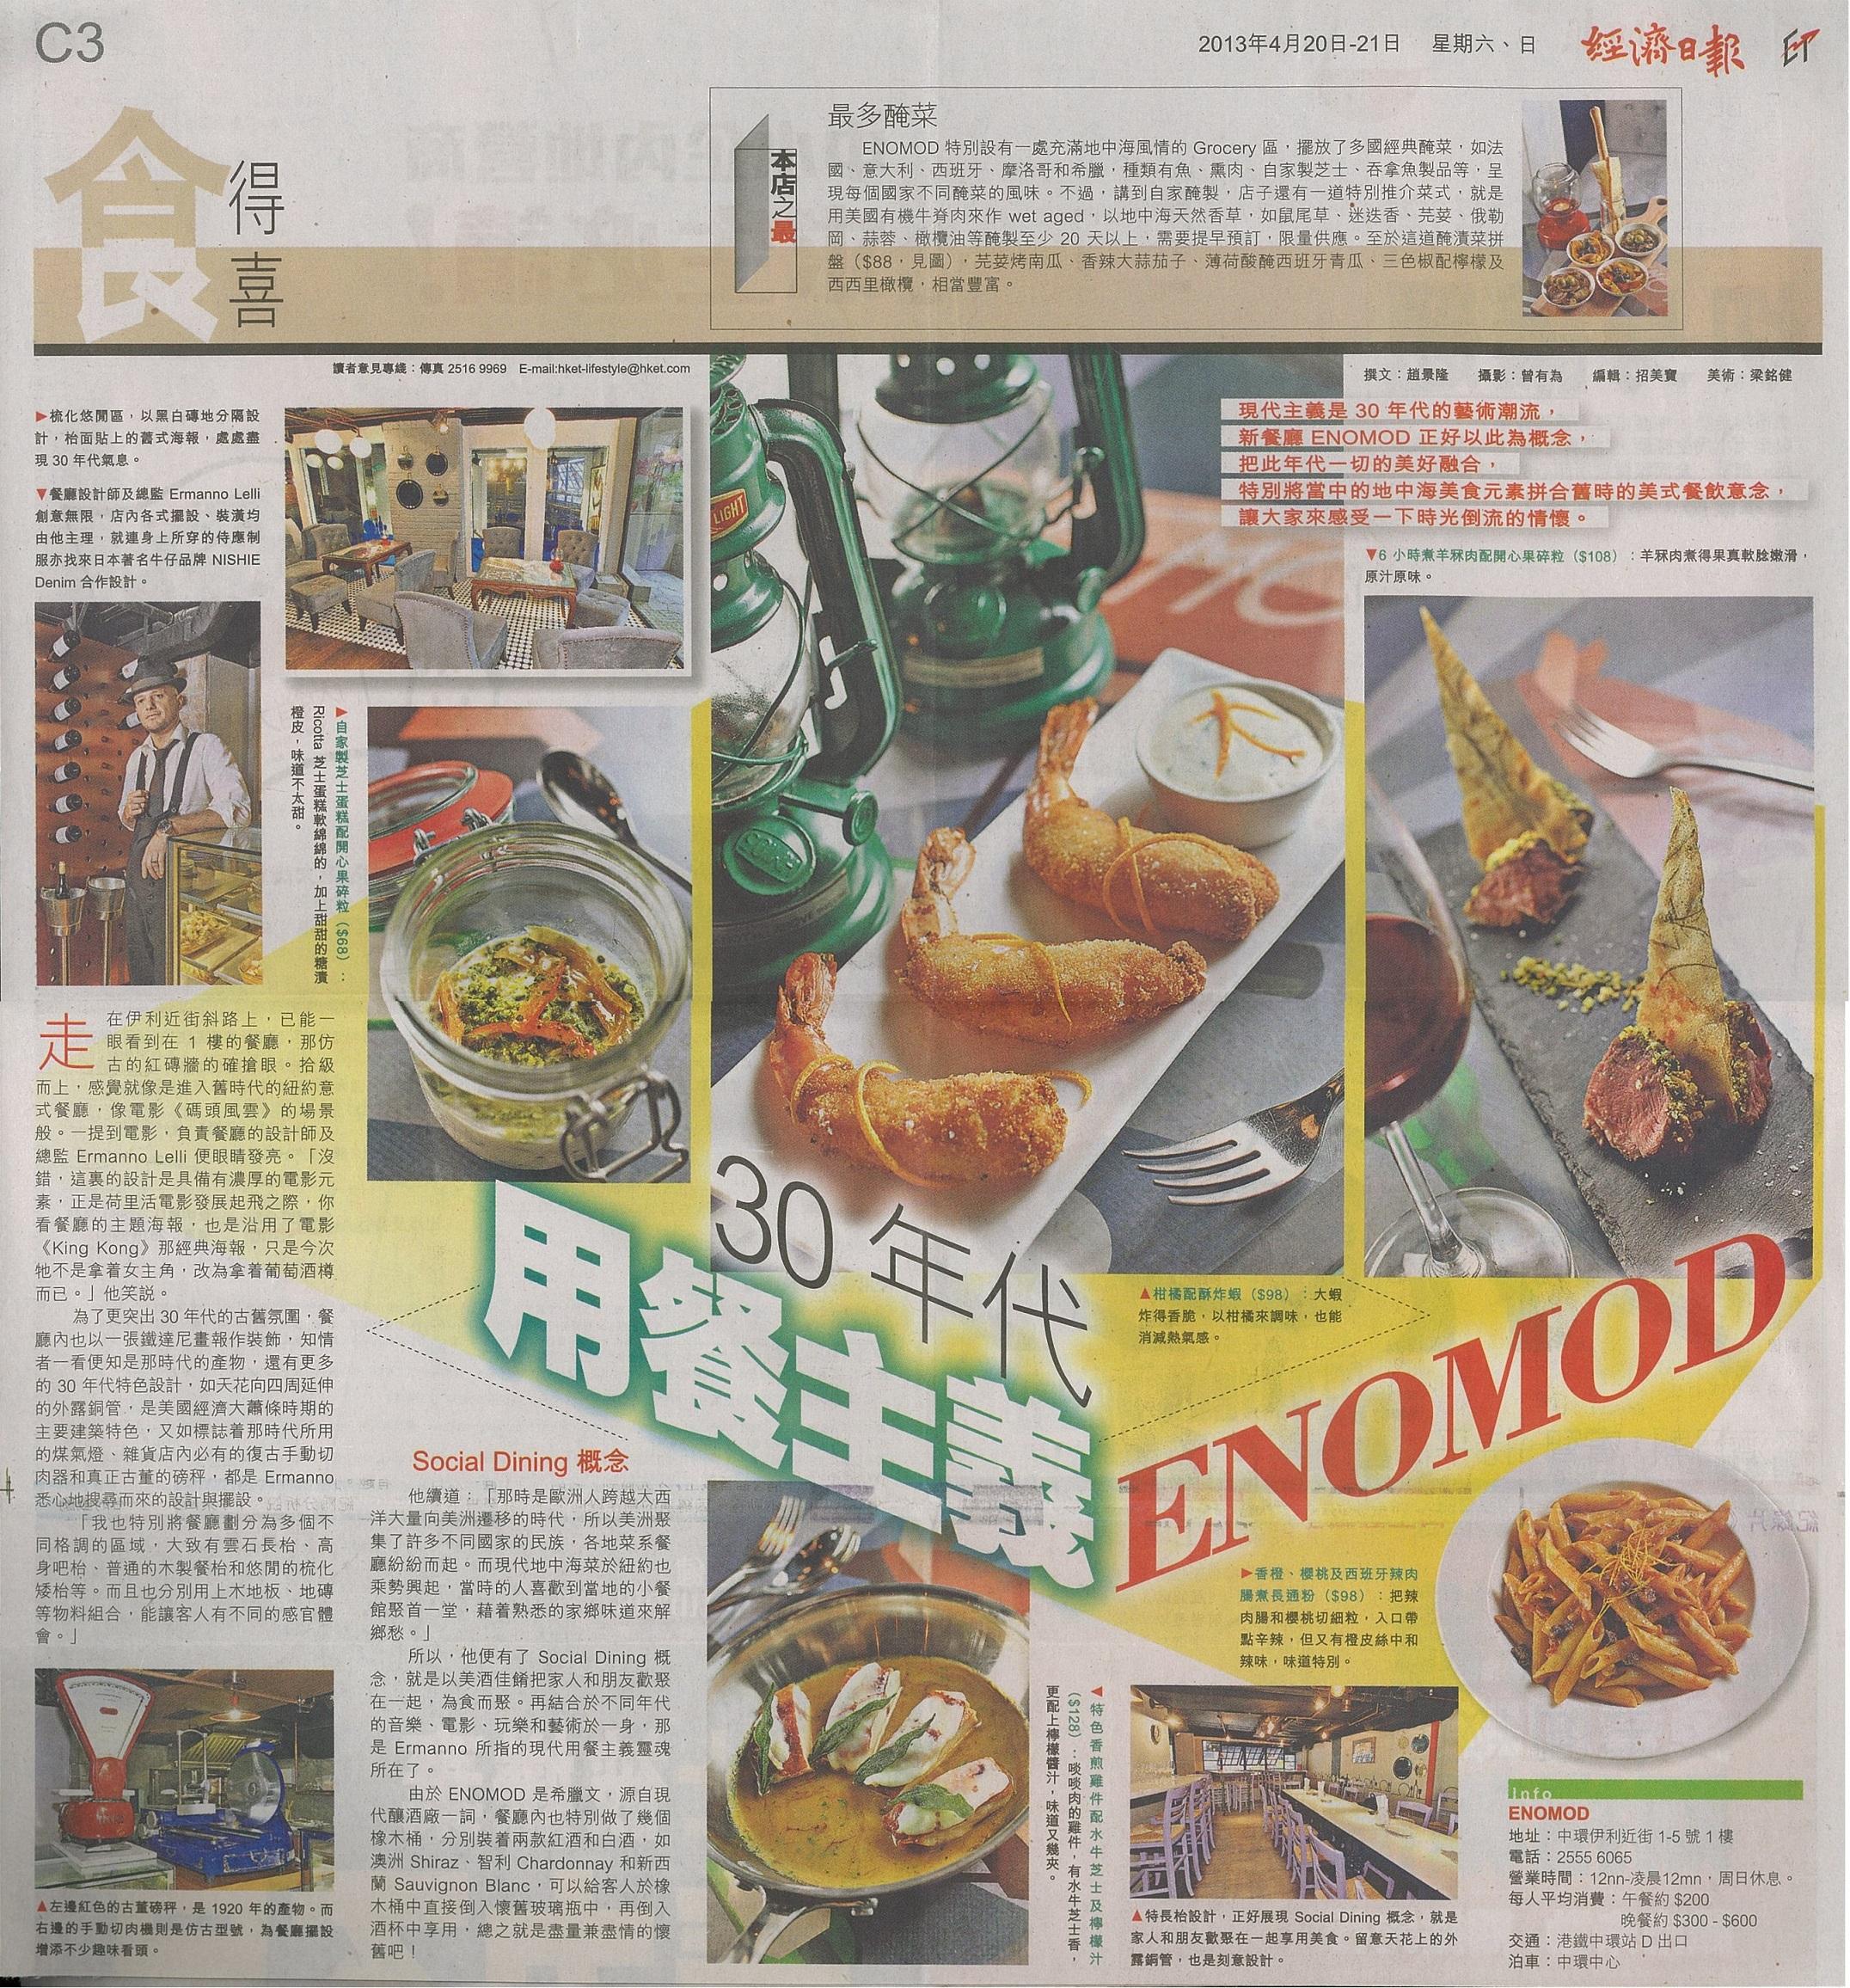 ENOMOD - 20.04 - Hong Kong Economic Times (C3).jpg